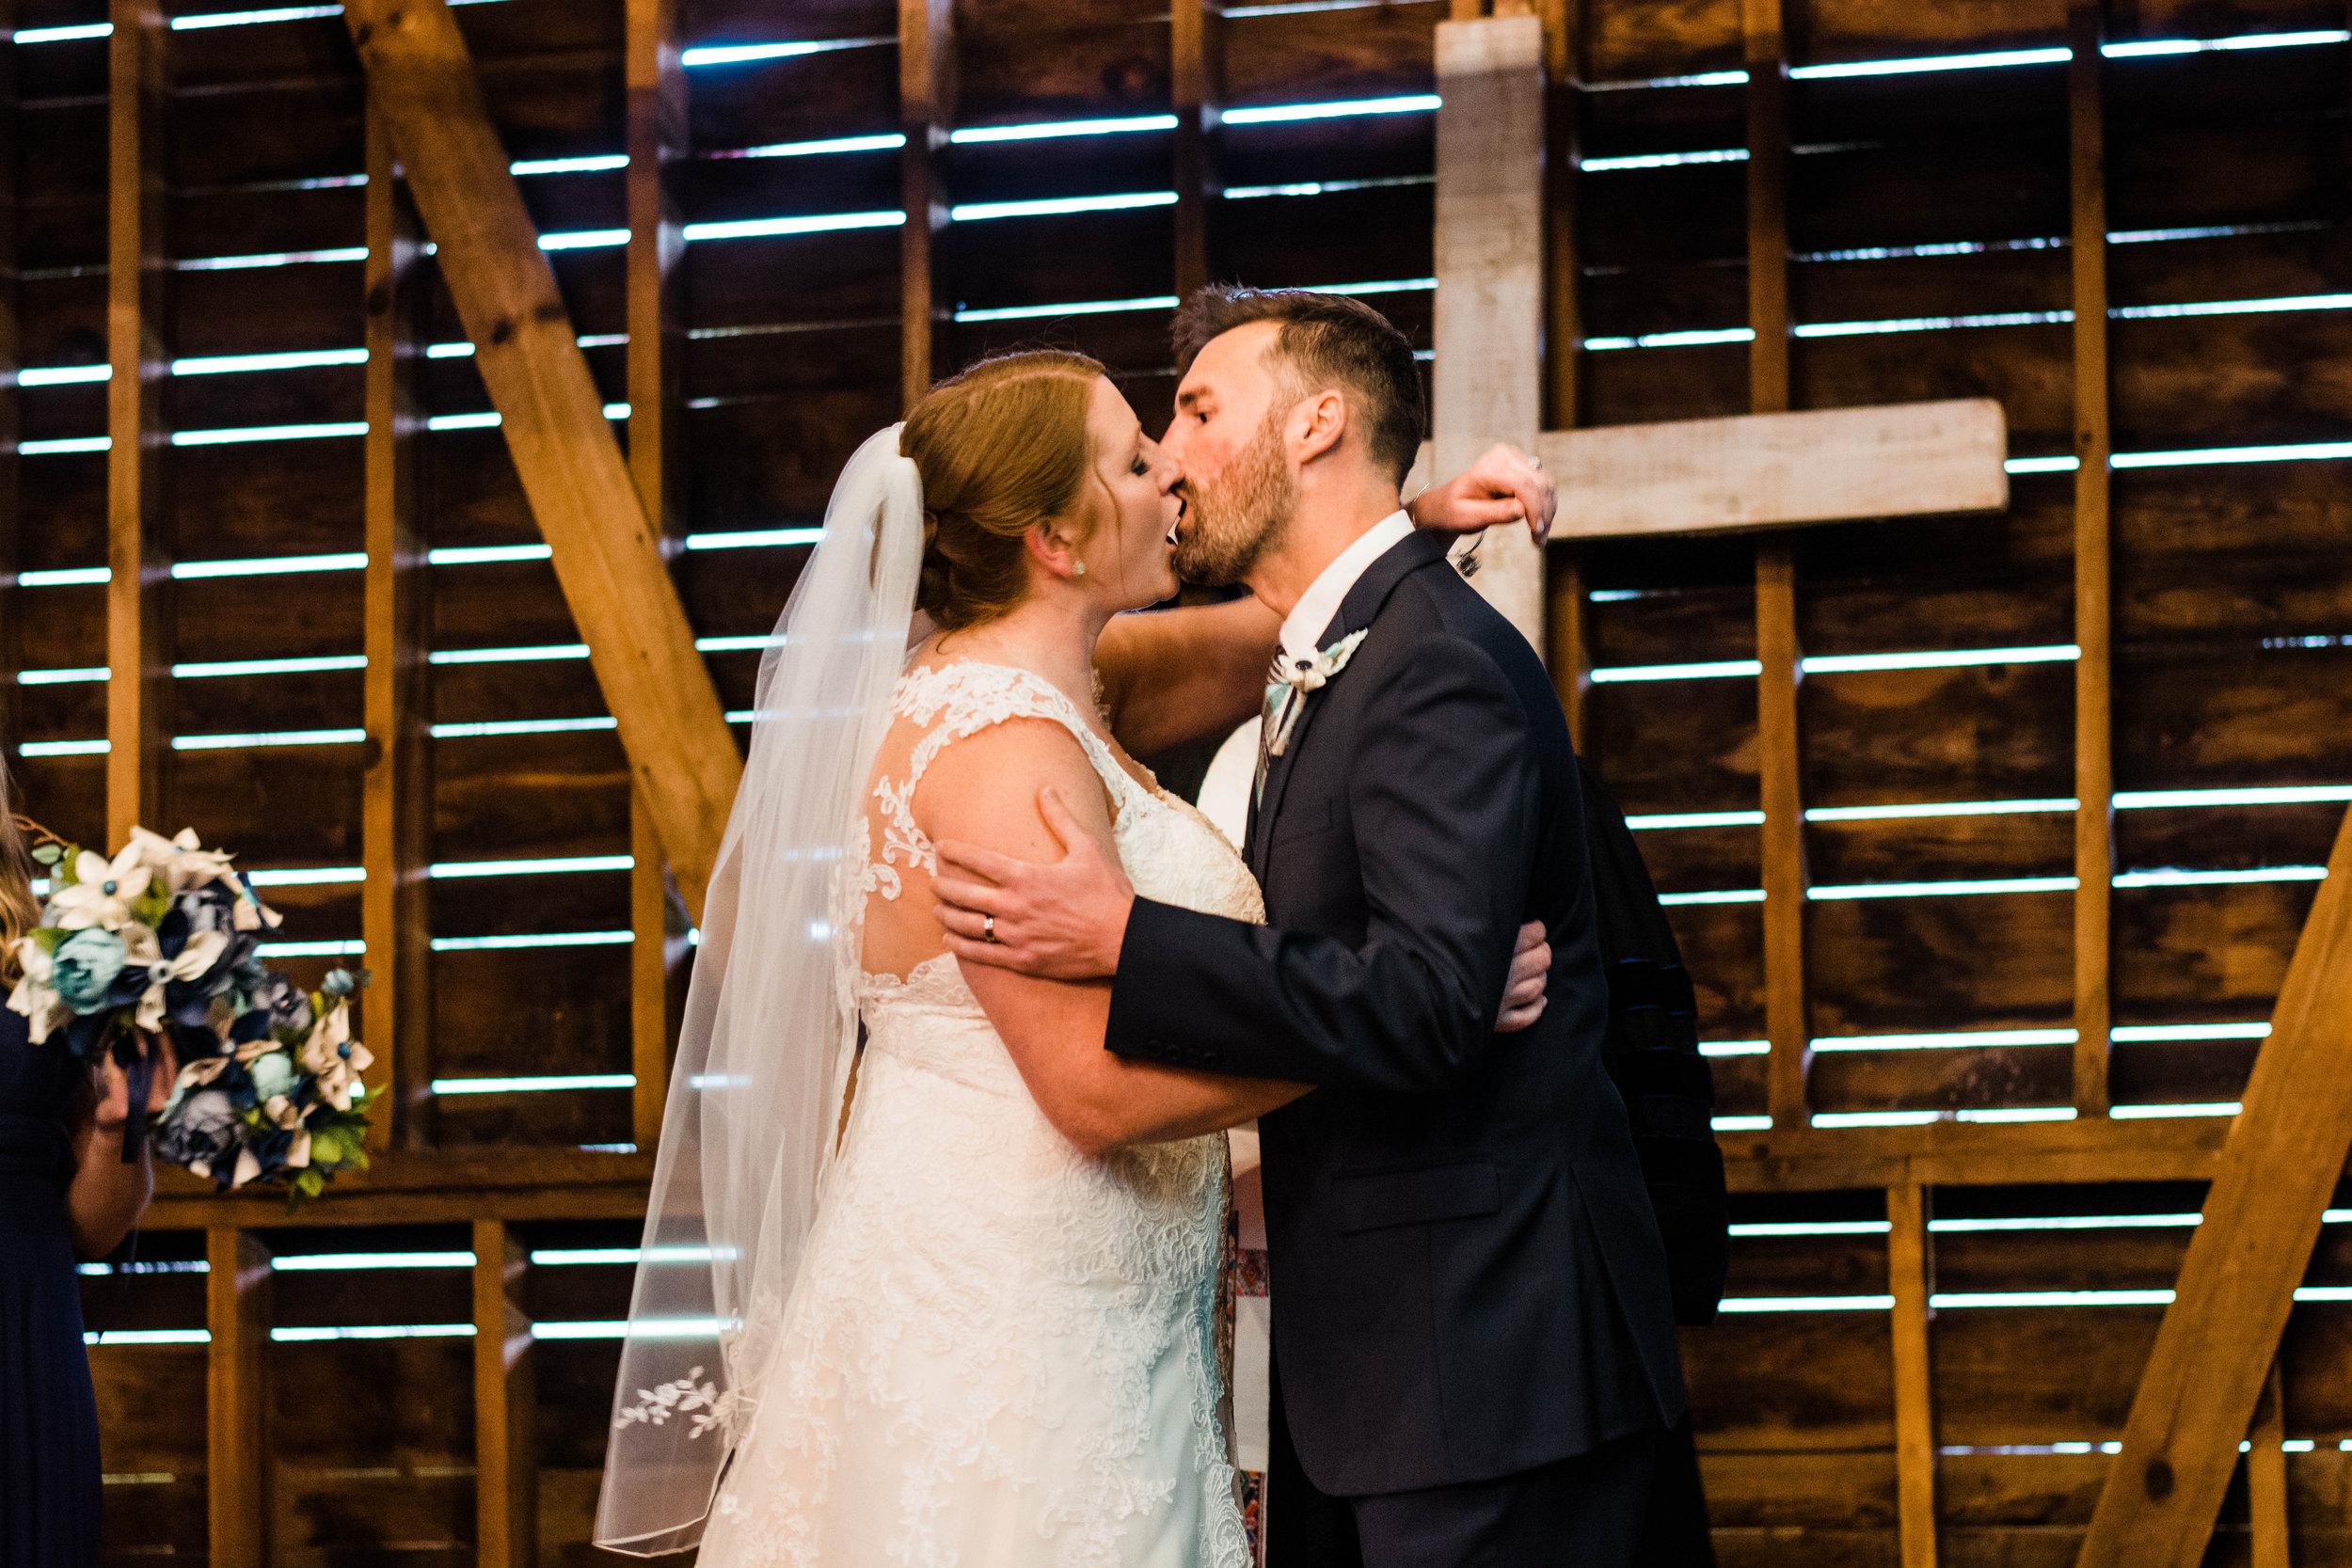 Honeysuckle-Hill-Weddings-Andrew-Rachel-276.jpg